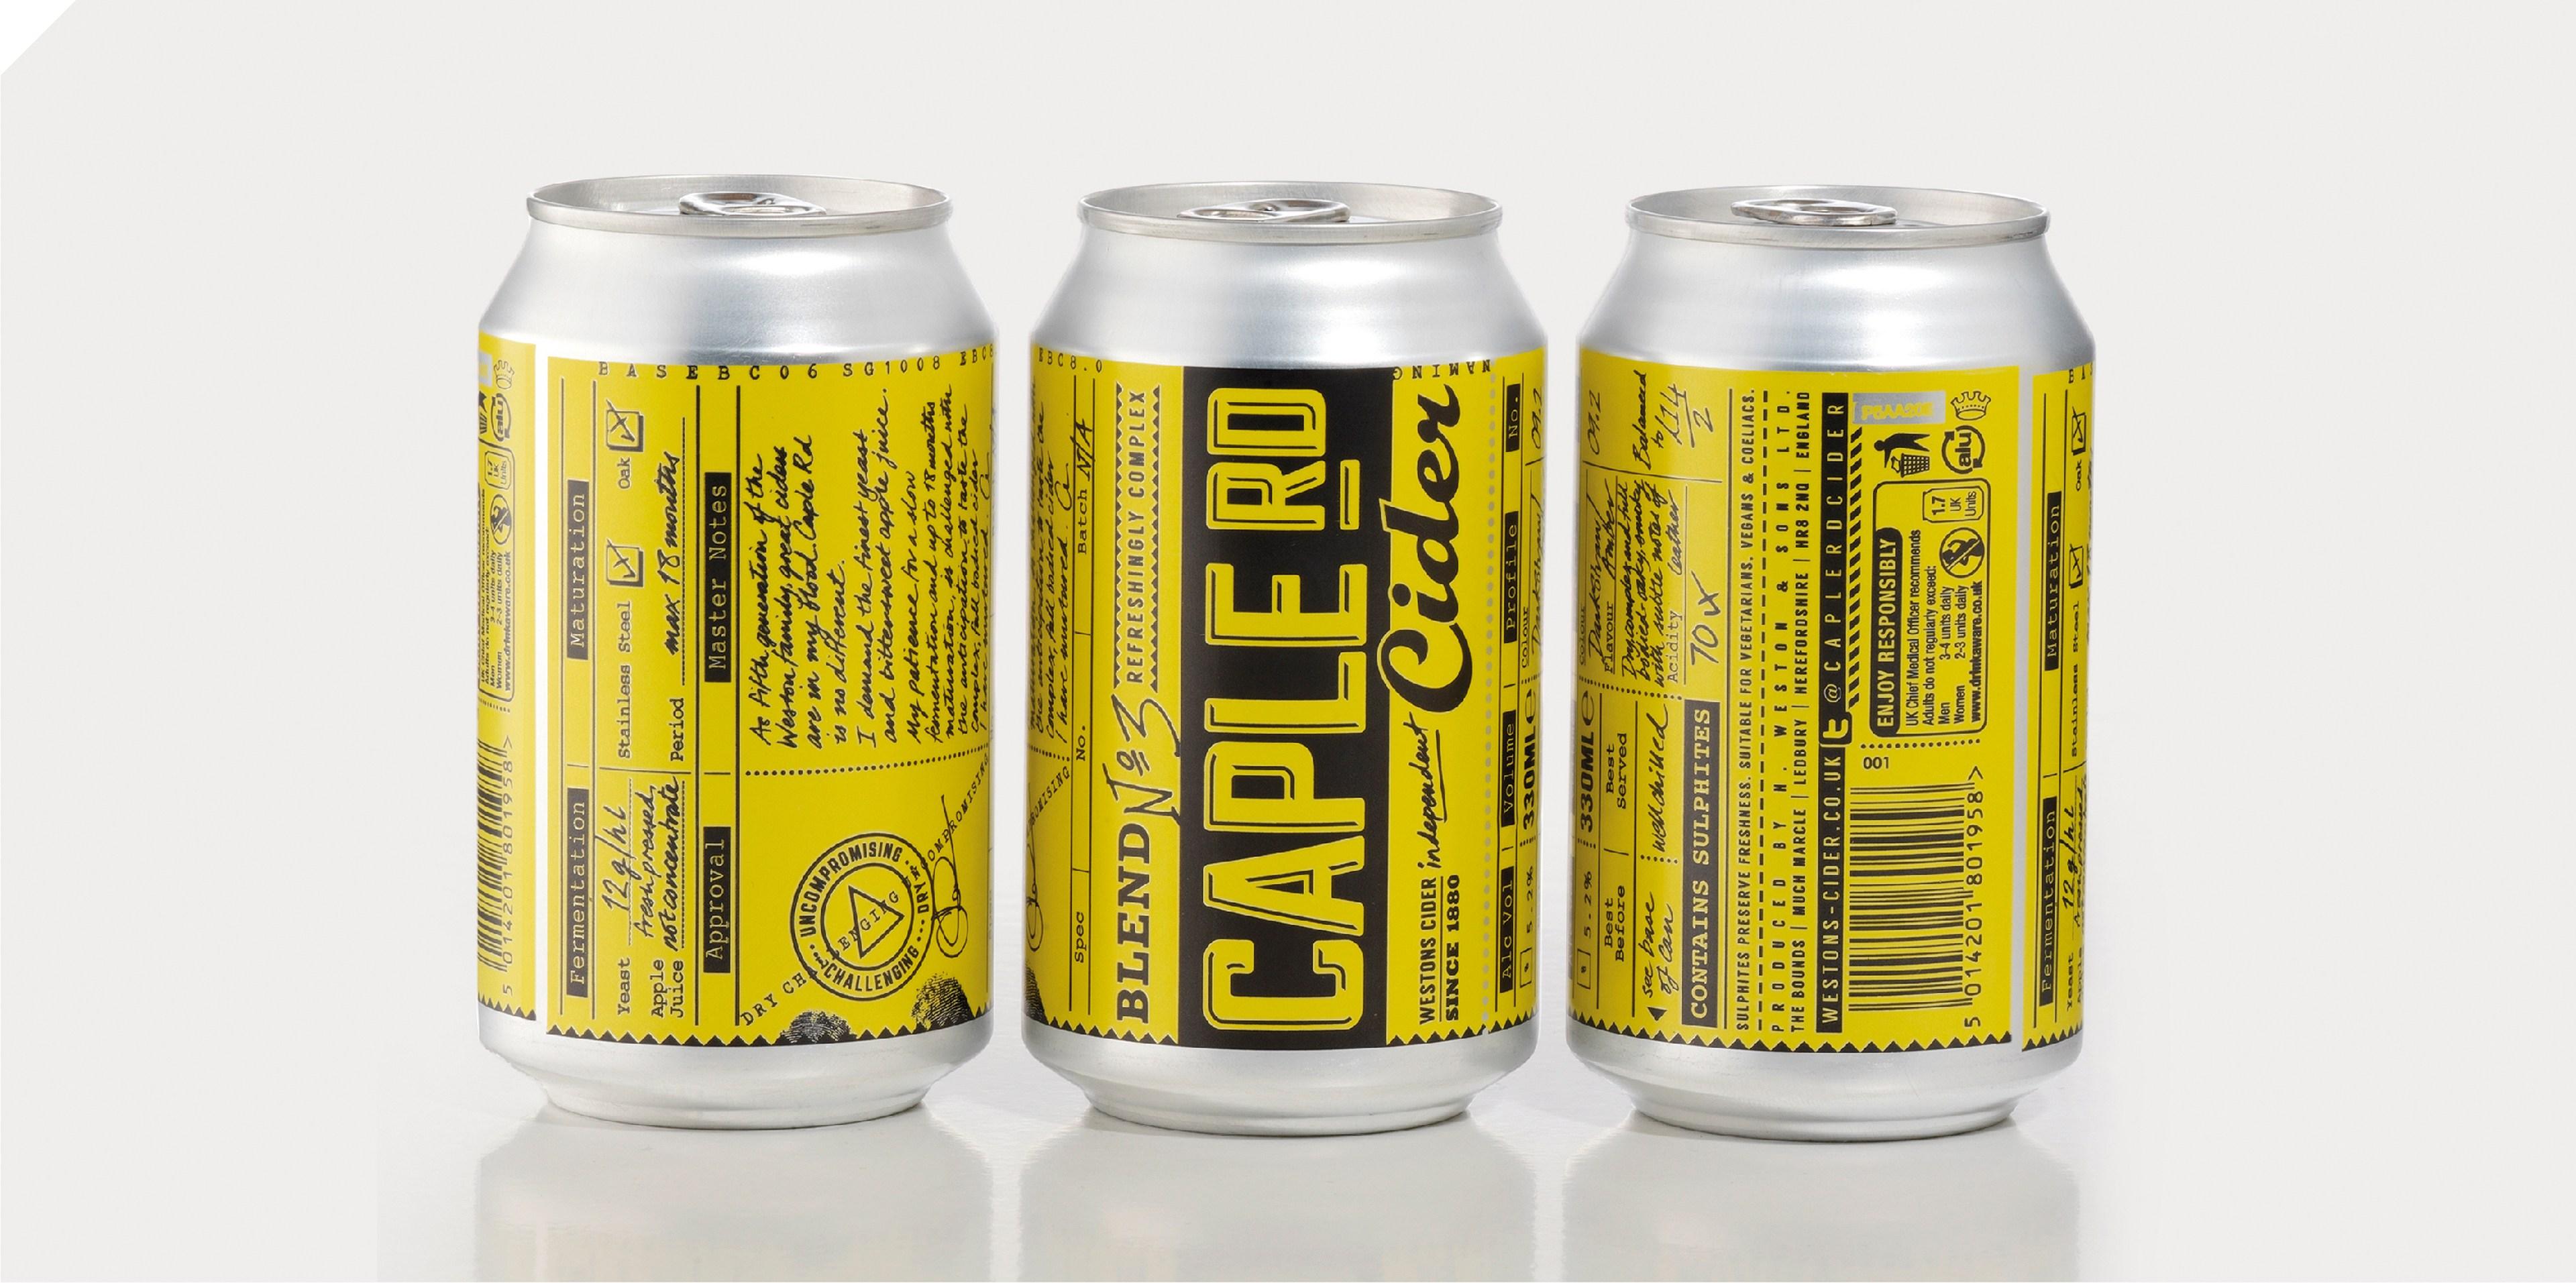 Brand on Shelf - Work - Westons Cider - Caple Rd Cider  Can